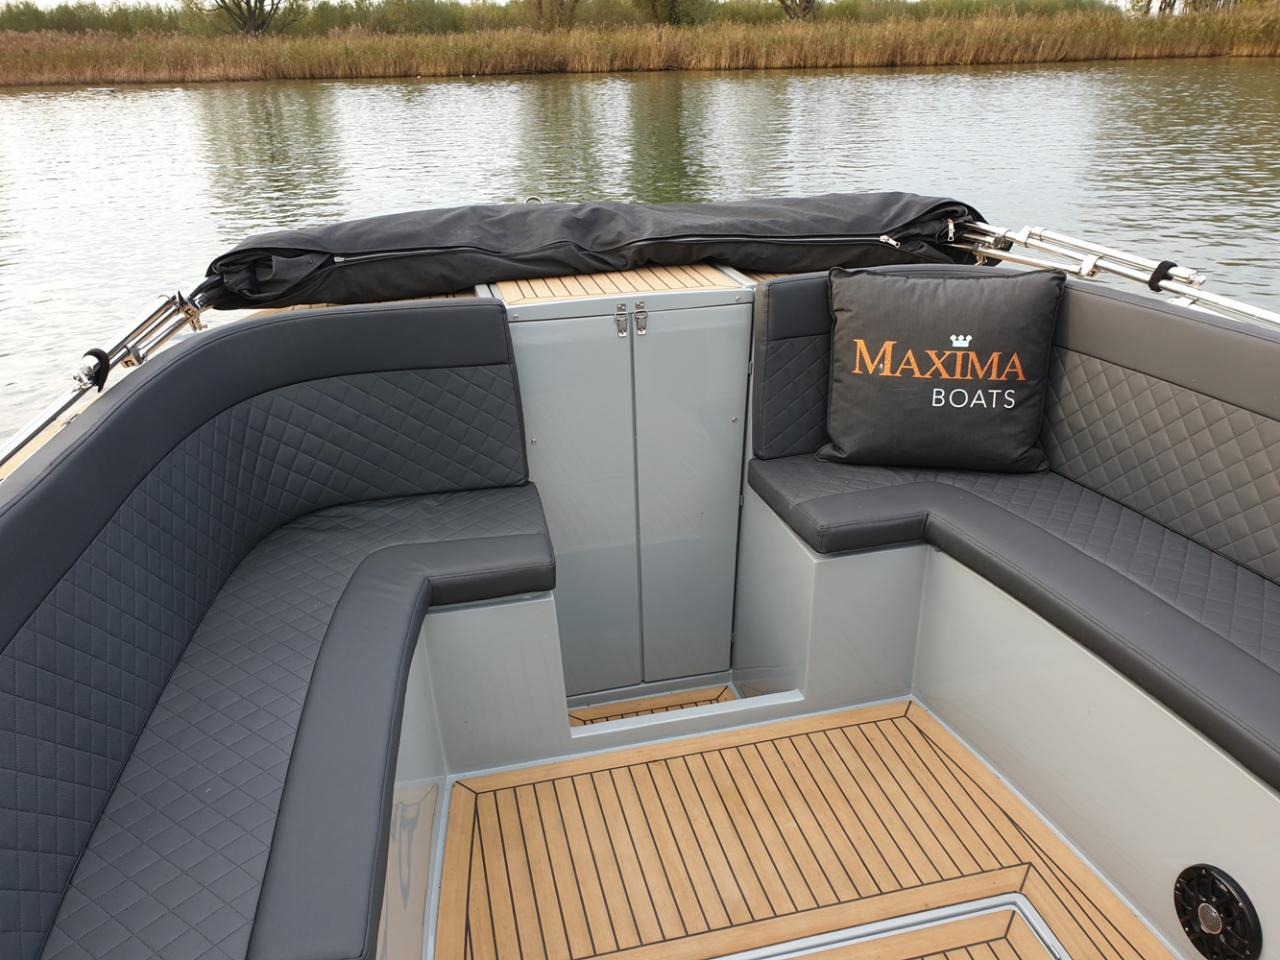 Maxima 840 tender 14